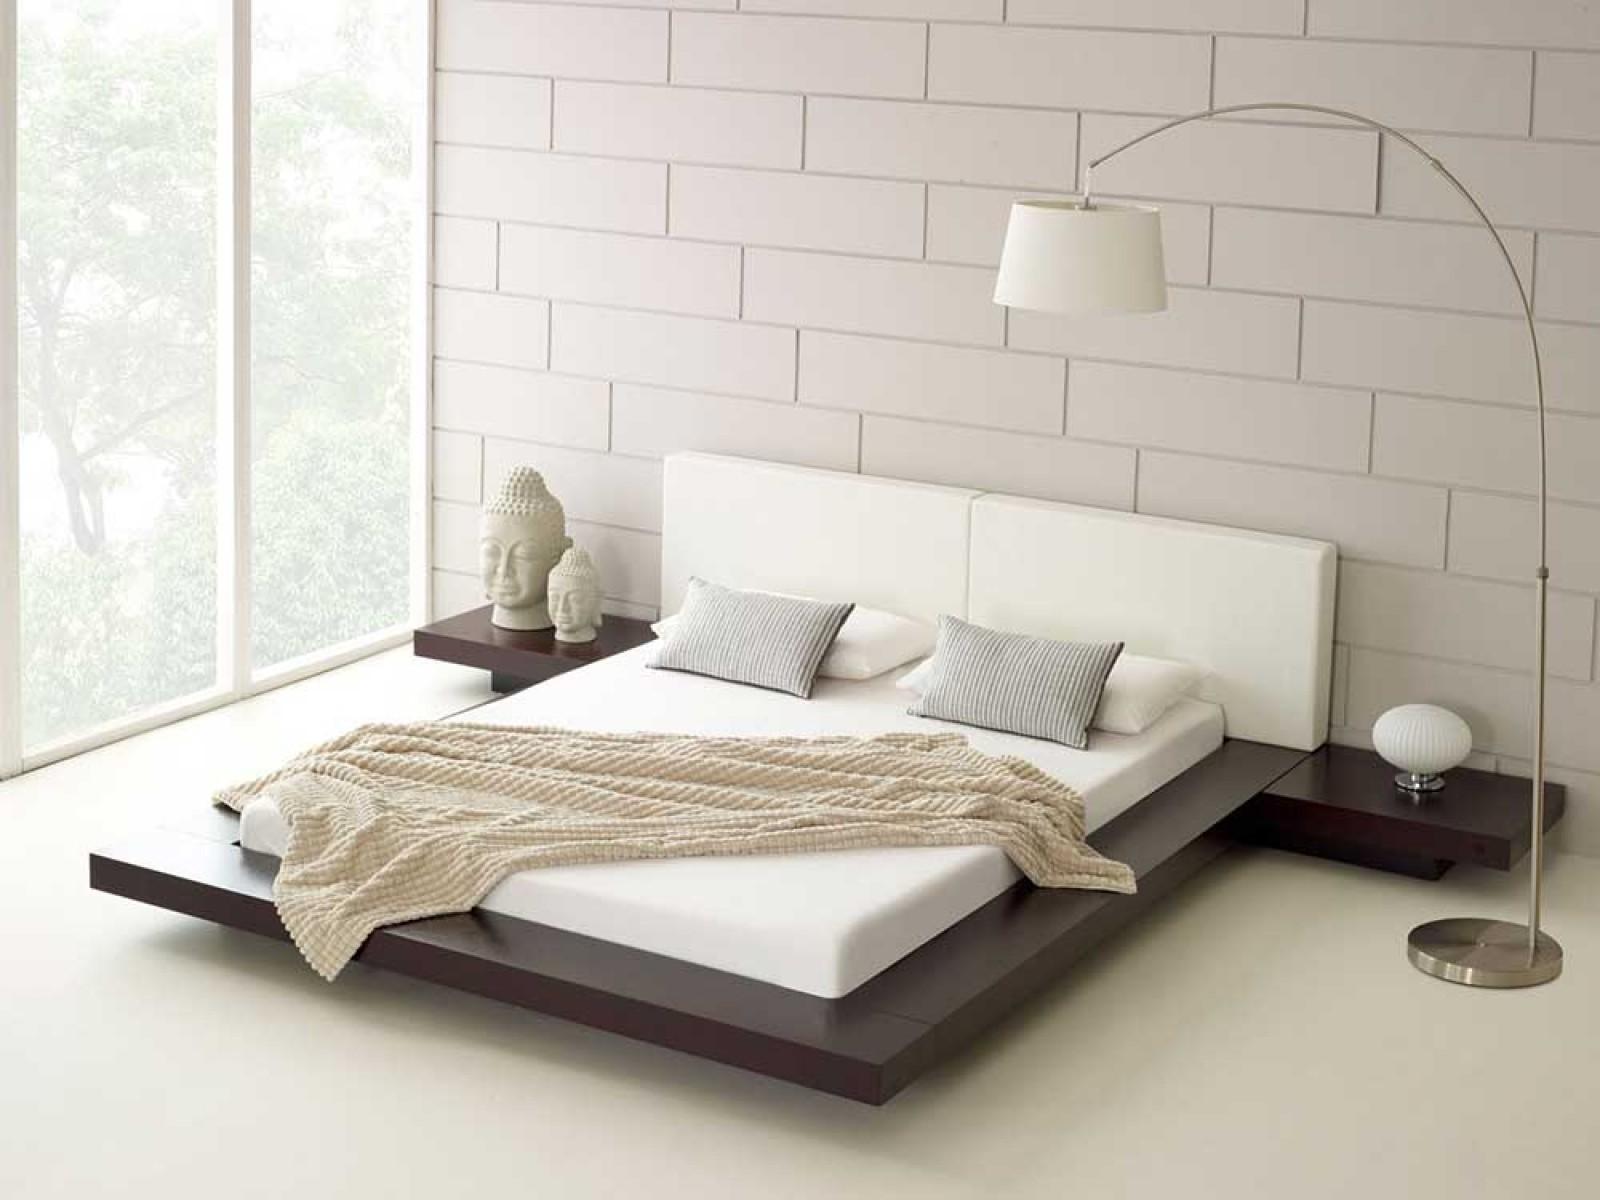 cama moderna simples